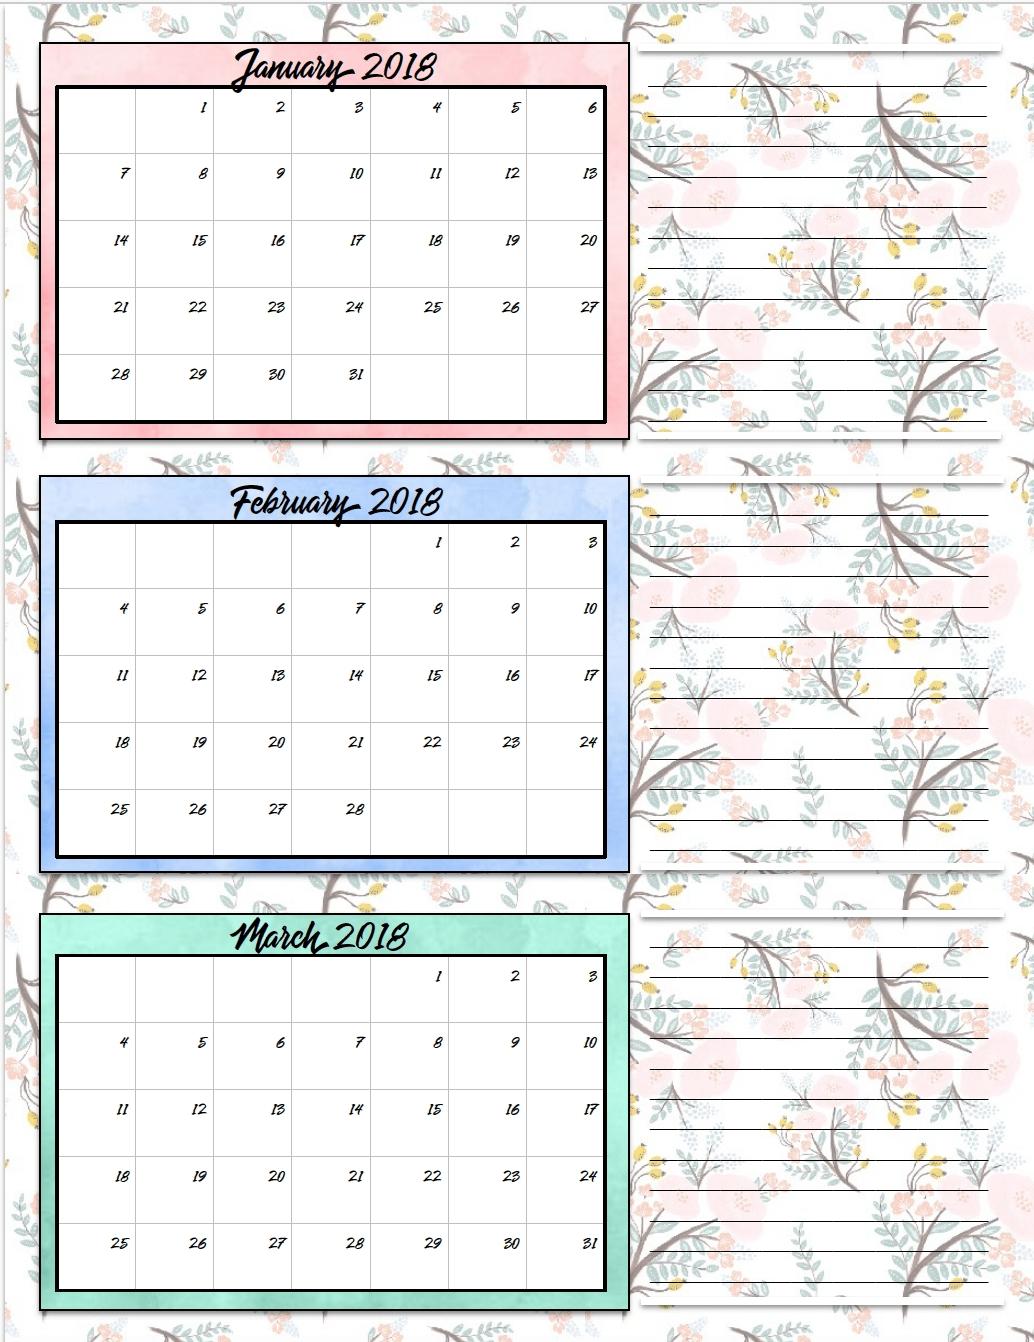 Free Printable 2018 Quarterly Calendars 2 Designs3abry